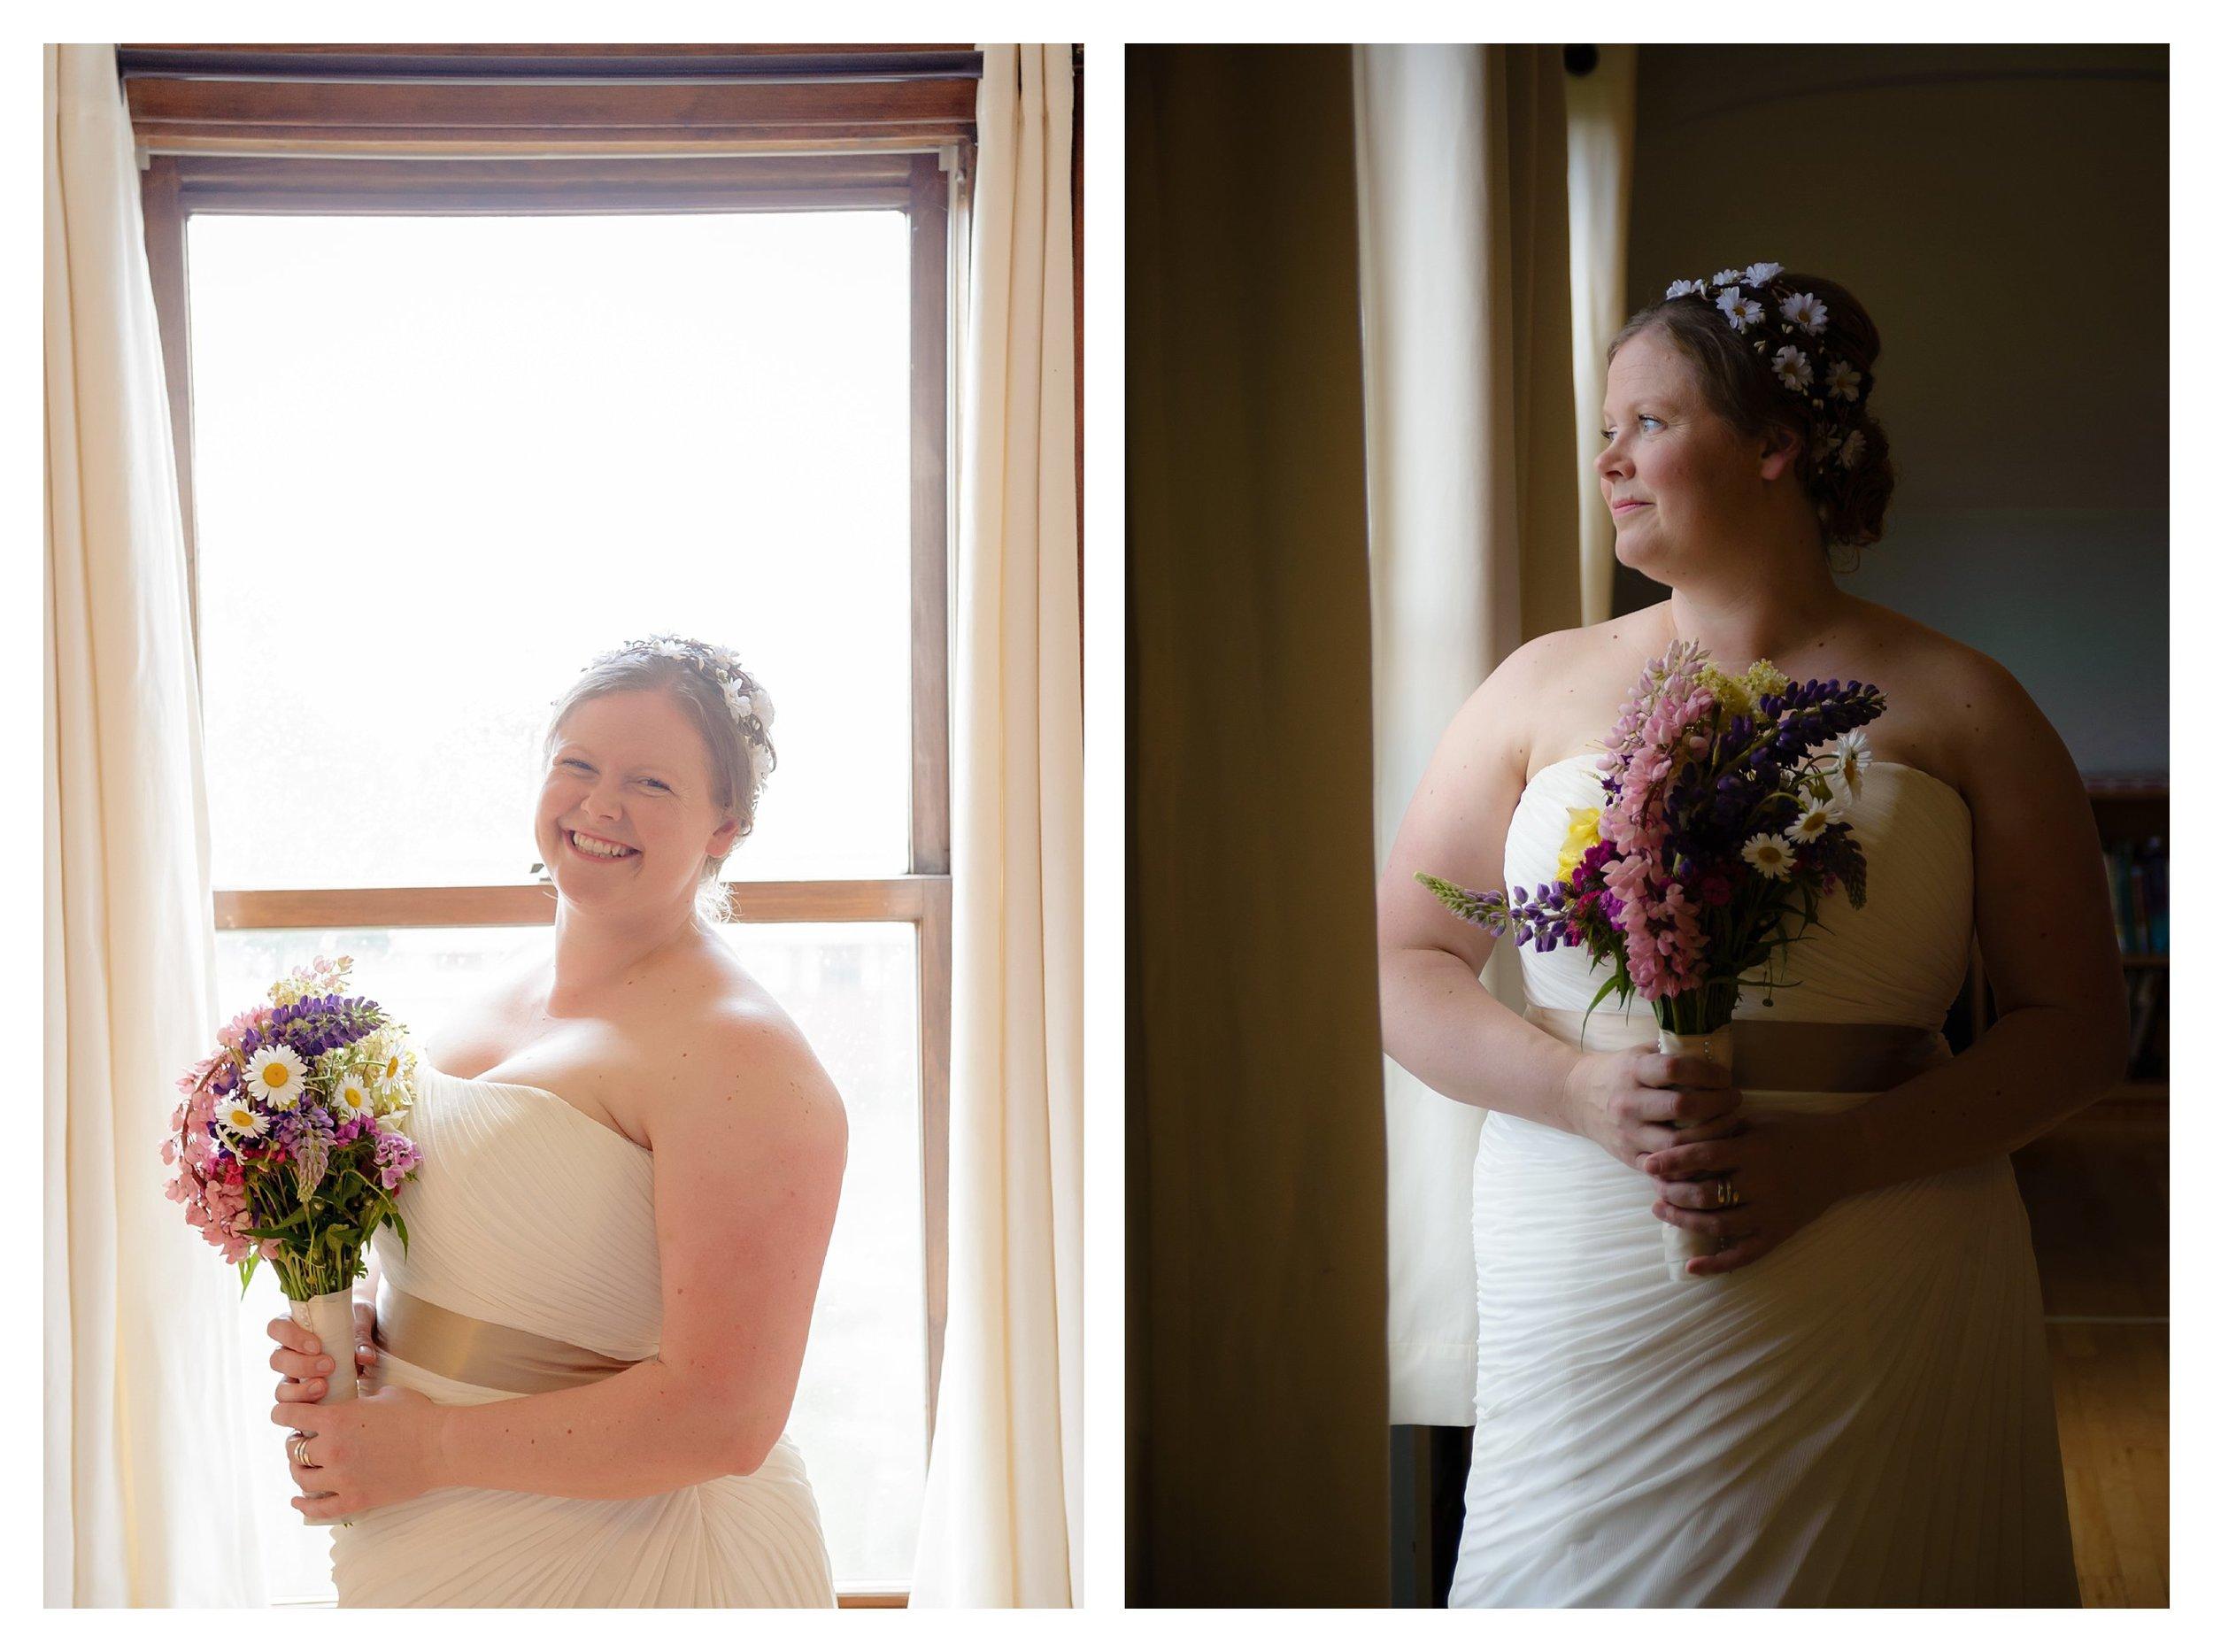 ashland oredock northwoods wisconsin wedding ps 139 photography_0273.jpg